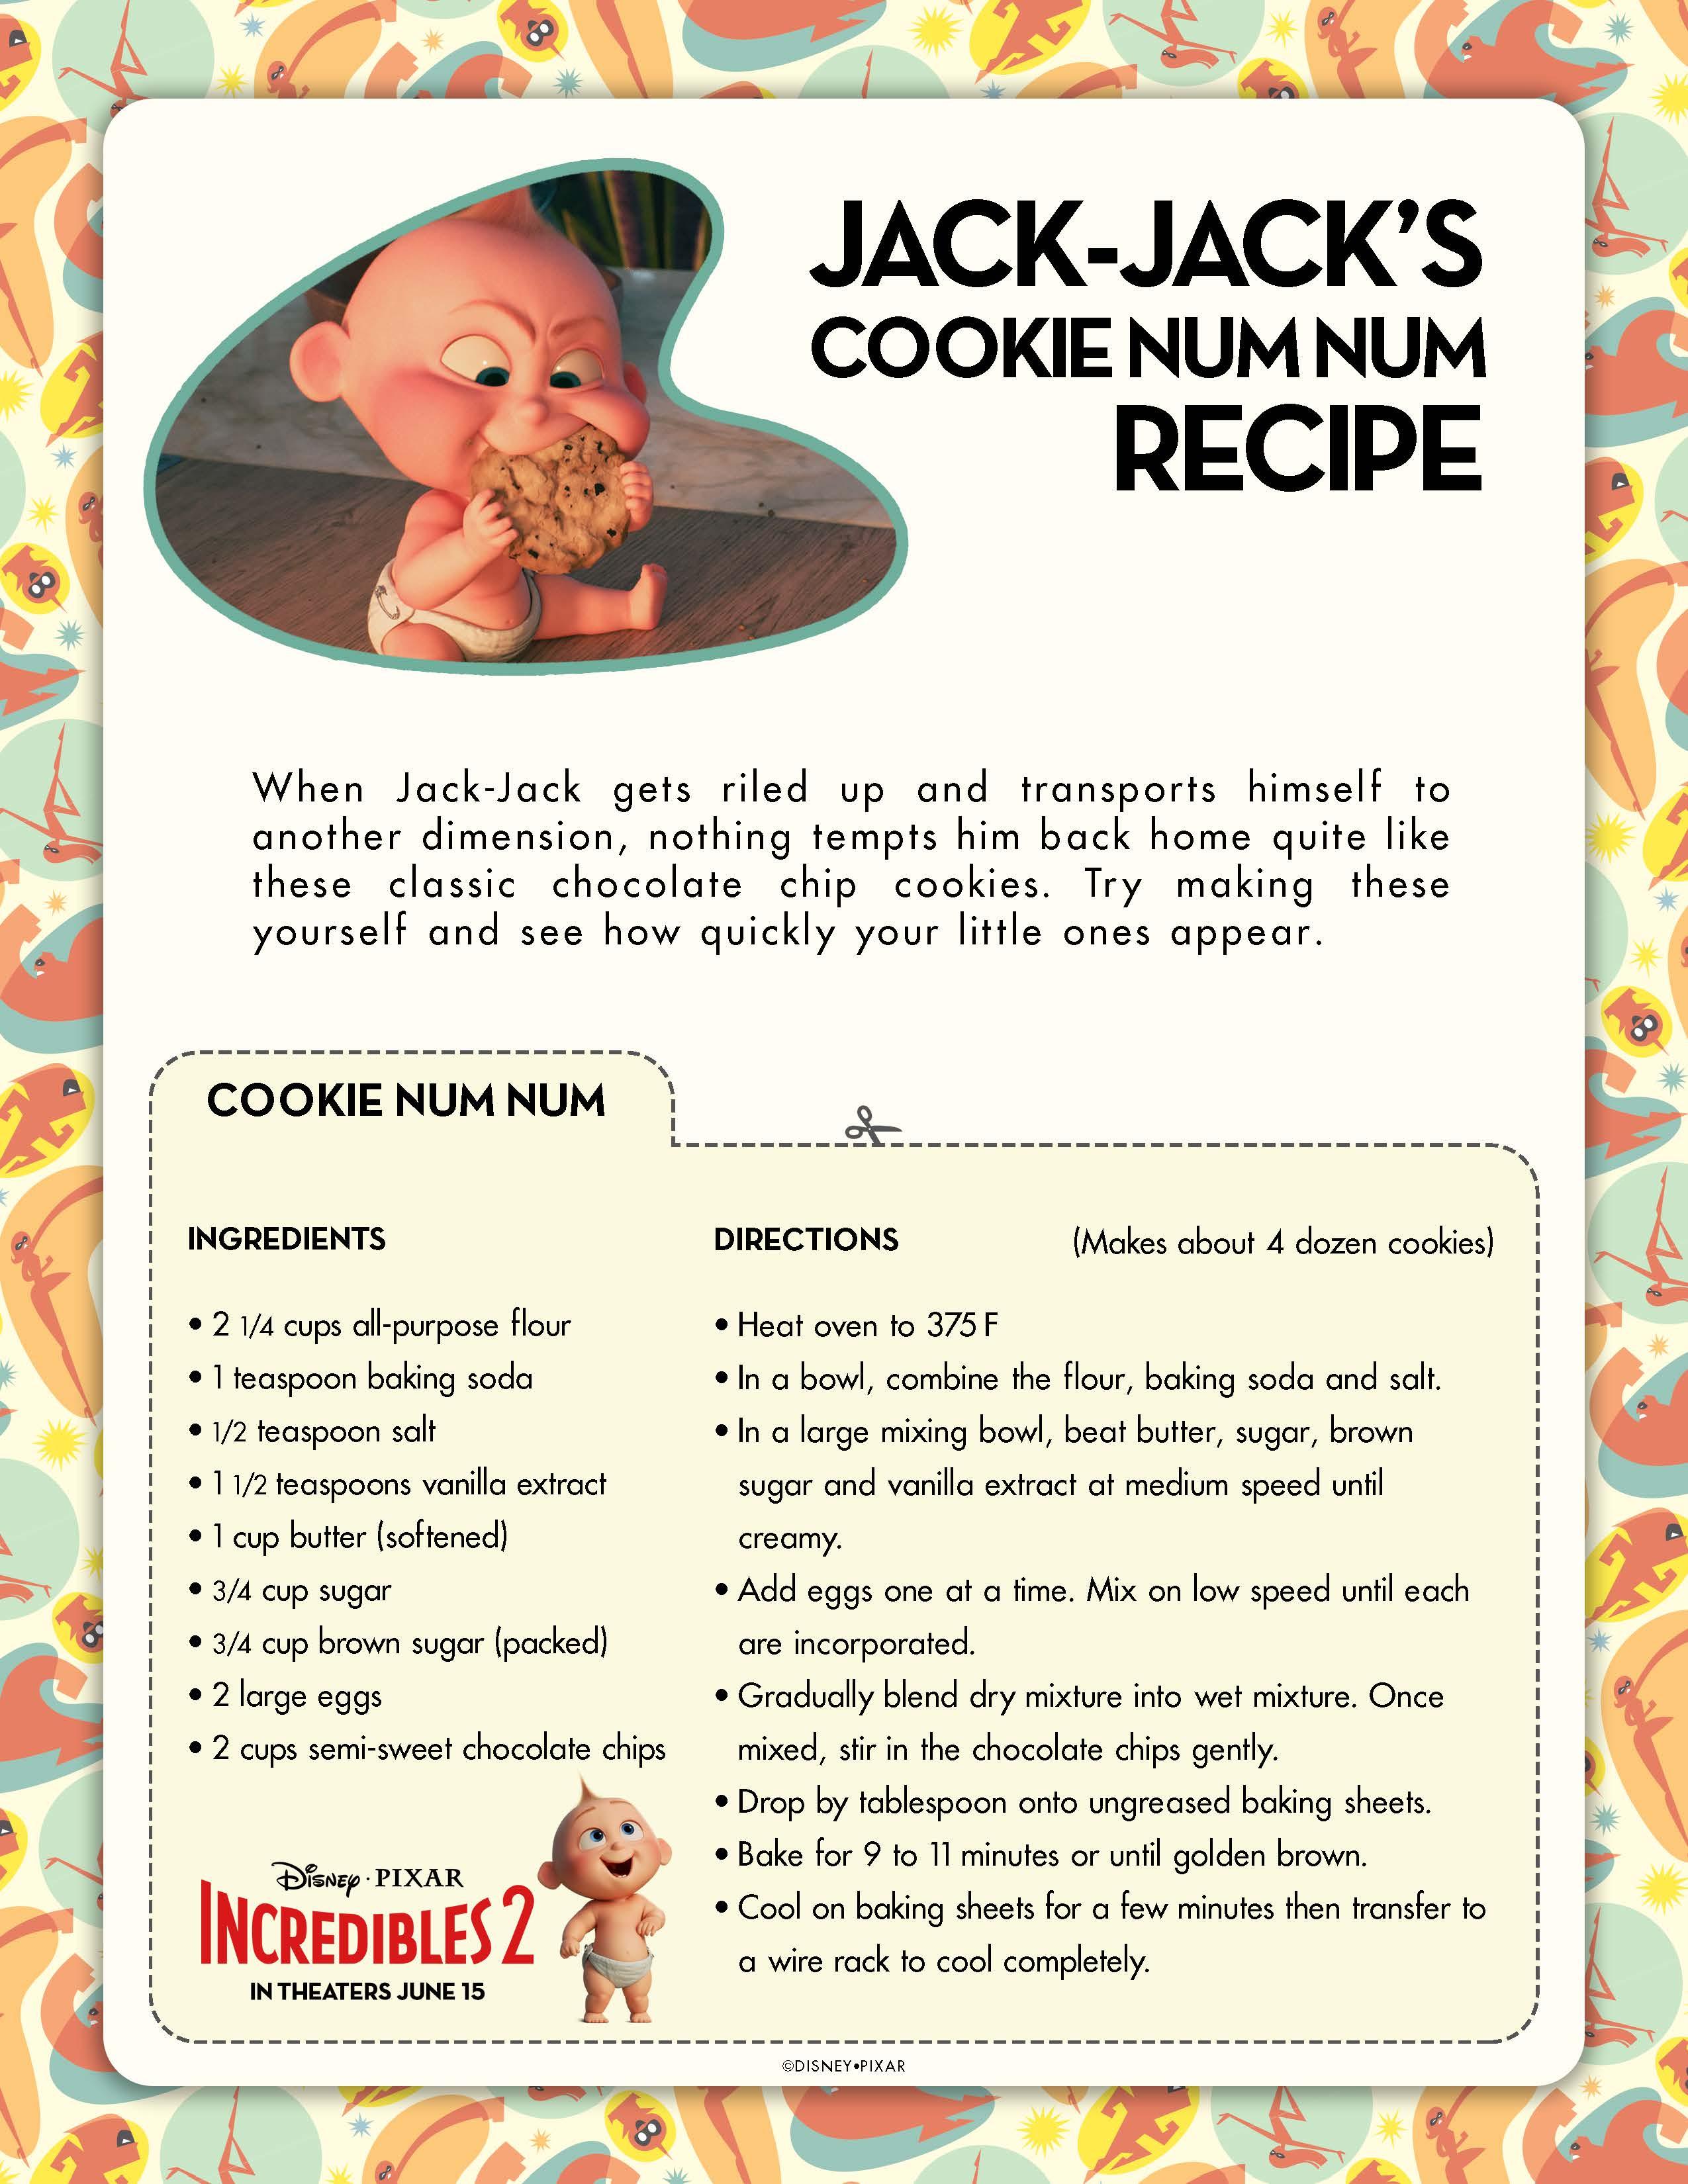 Jack Jack's Cookie Recipe